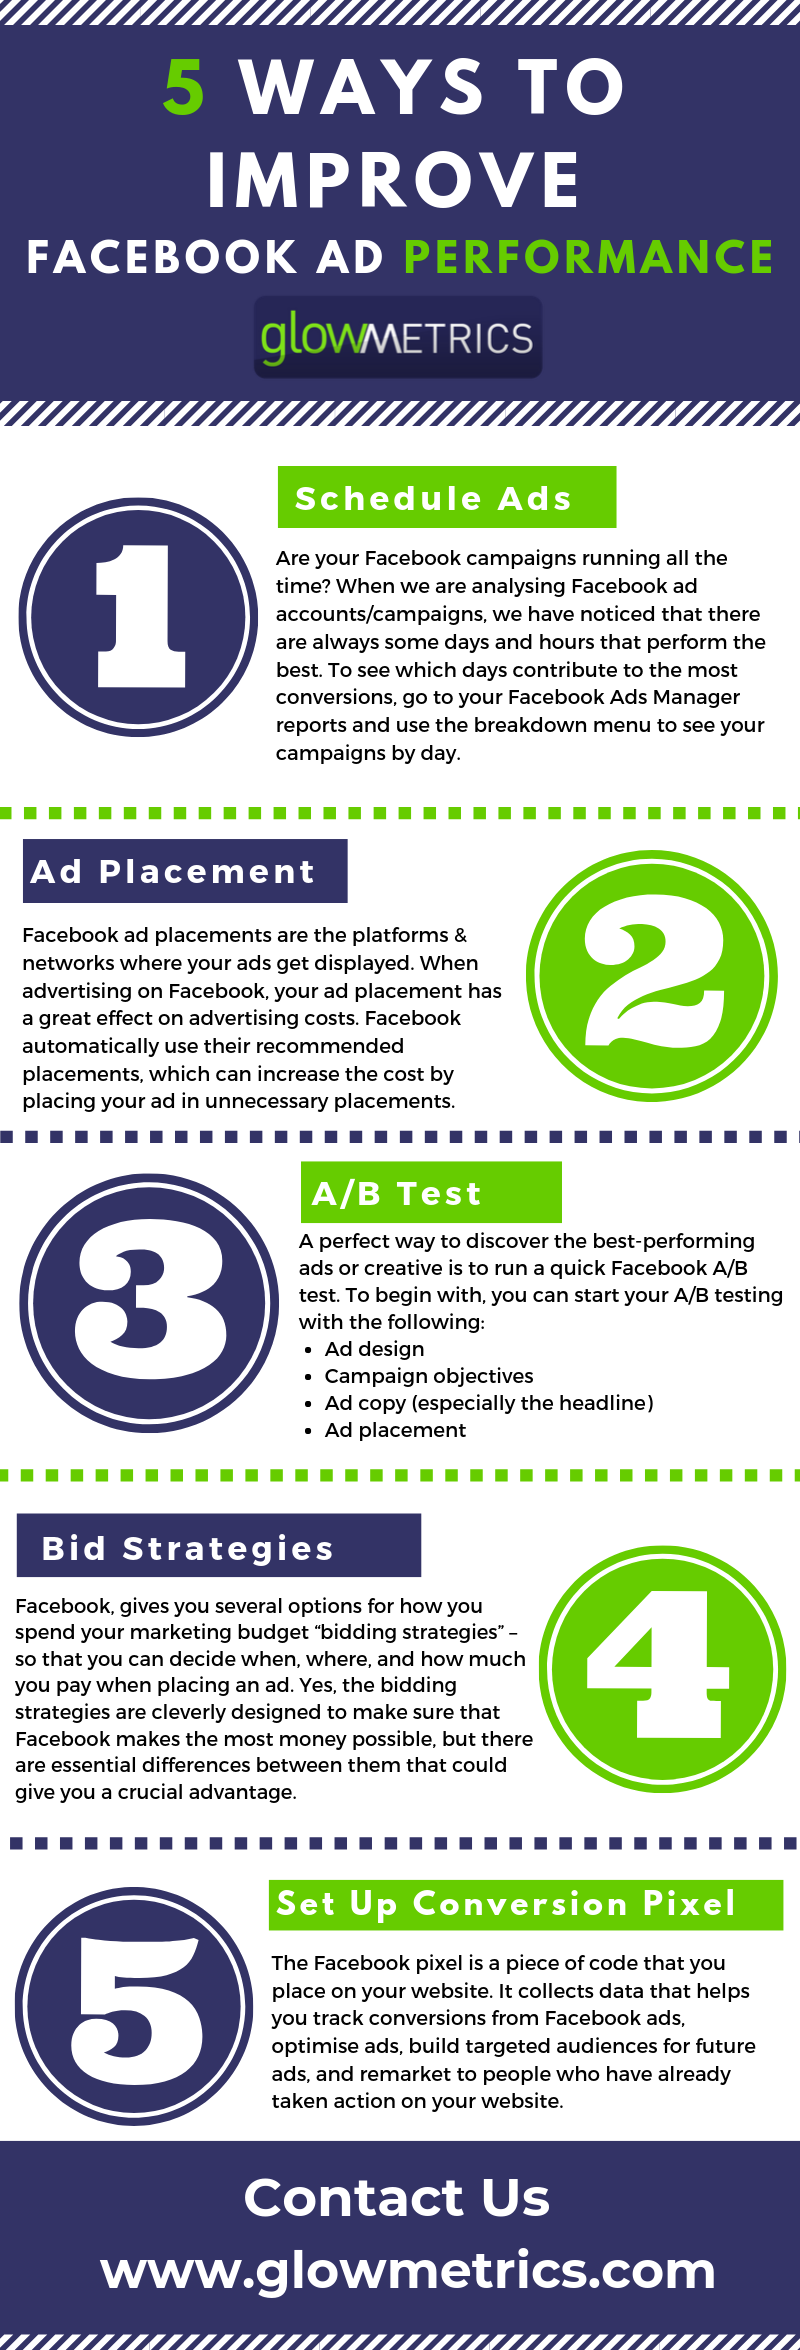 facebook_ad_performace_glowmetrics